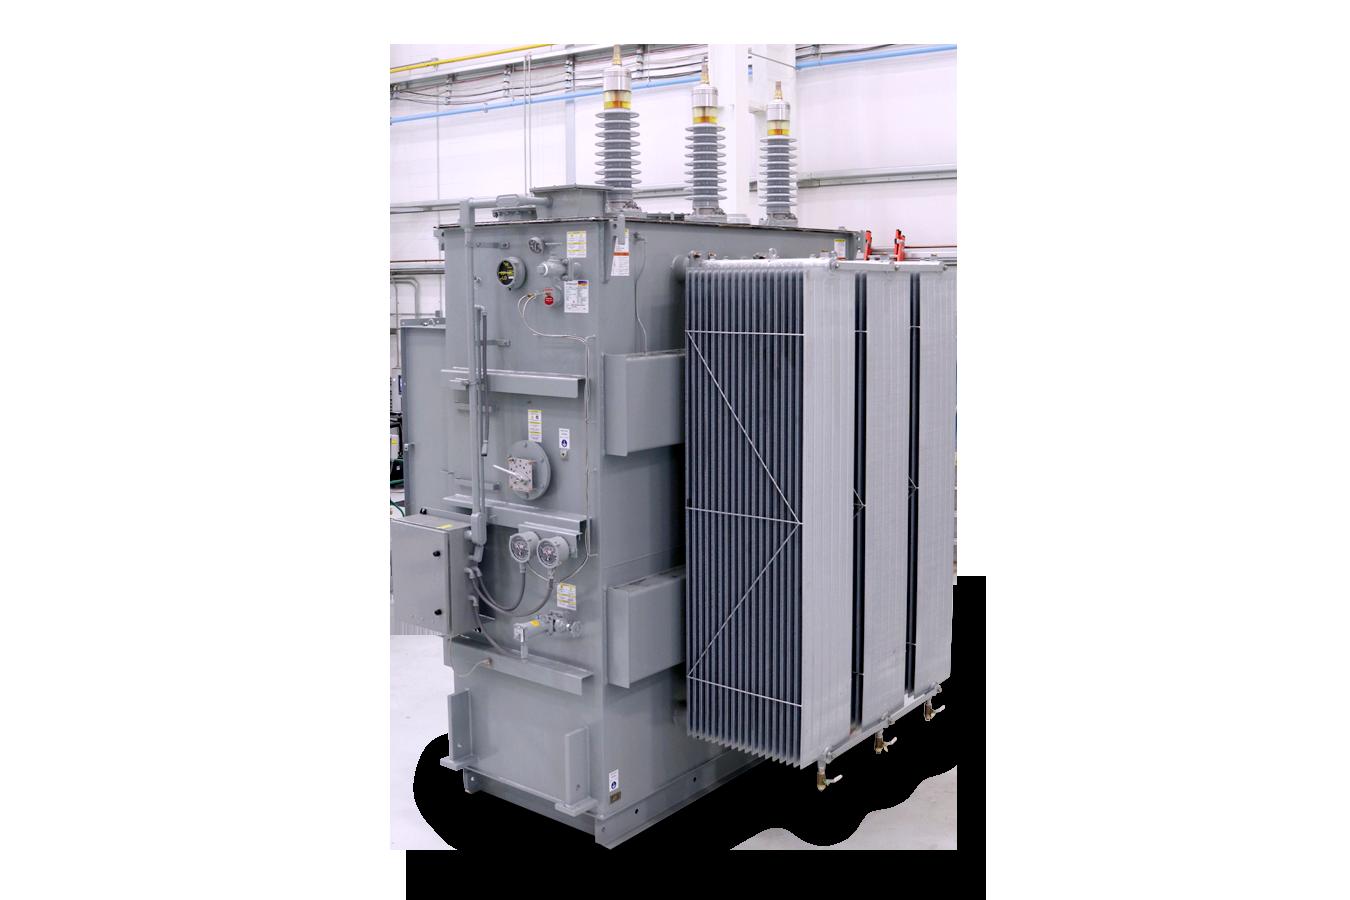 High Current Rectification Transformers - Niagara Power Transformer